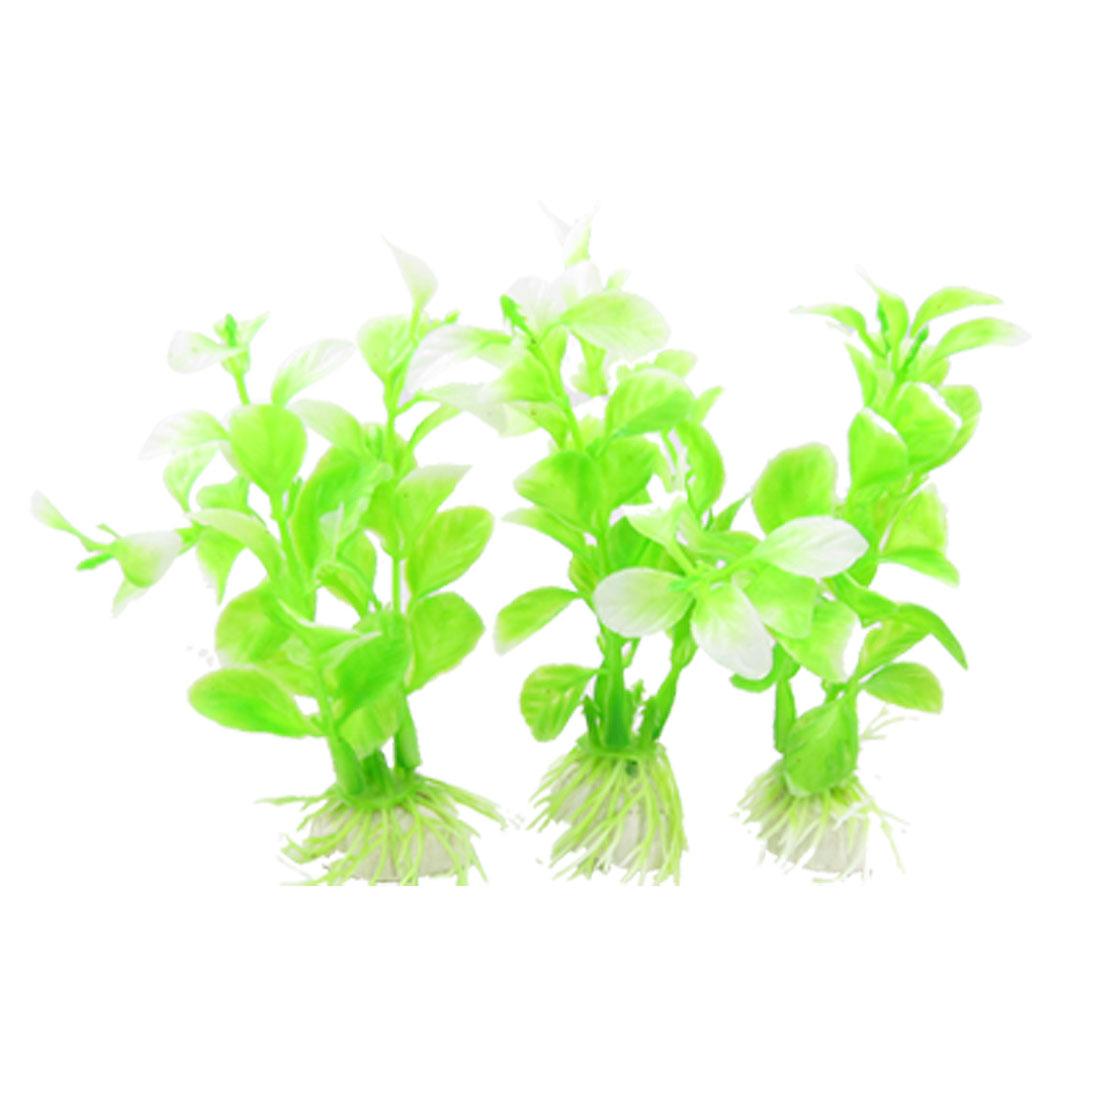 3Pcs Light Green Oval Leaves Plastic Plant Ornament for Aquarium